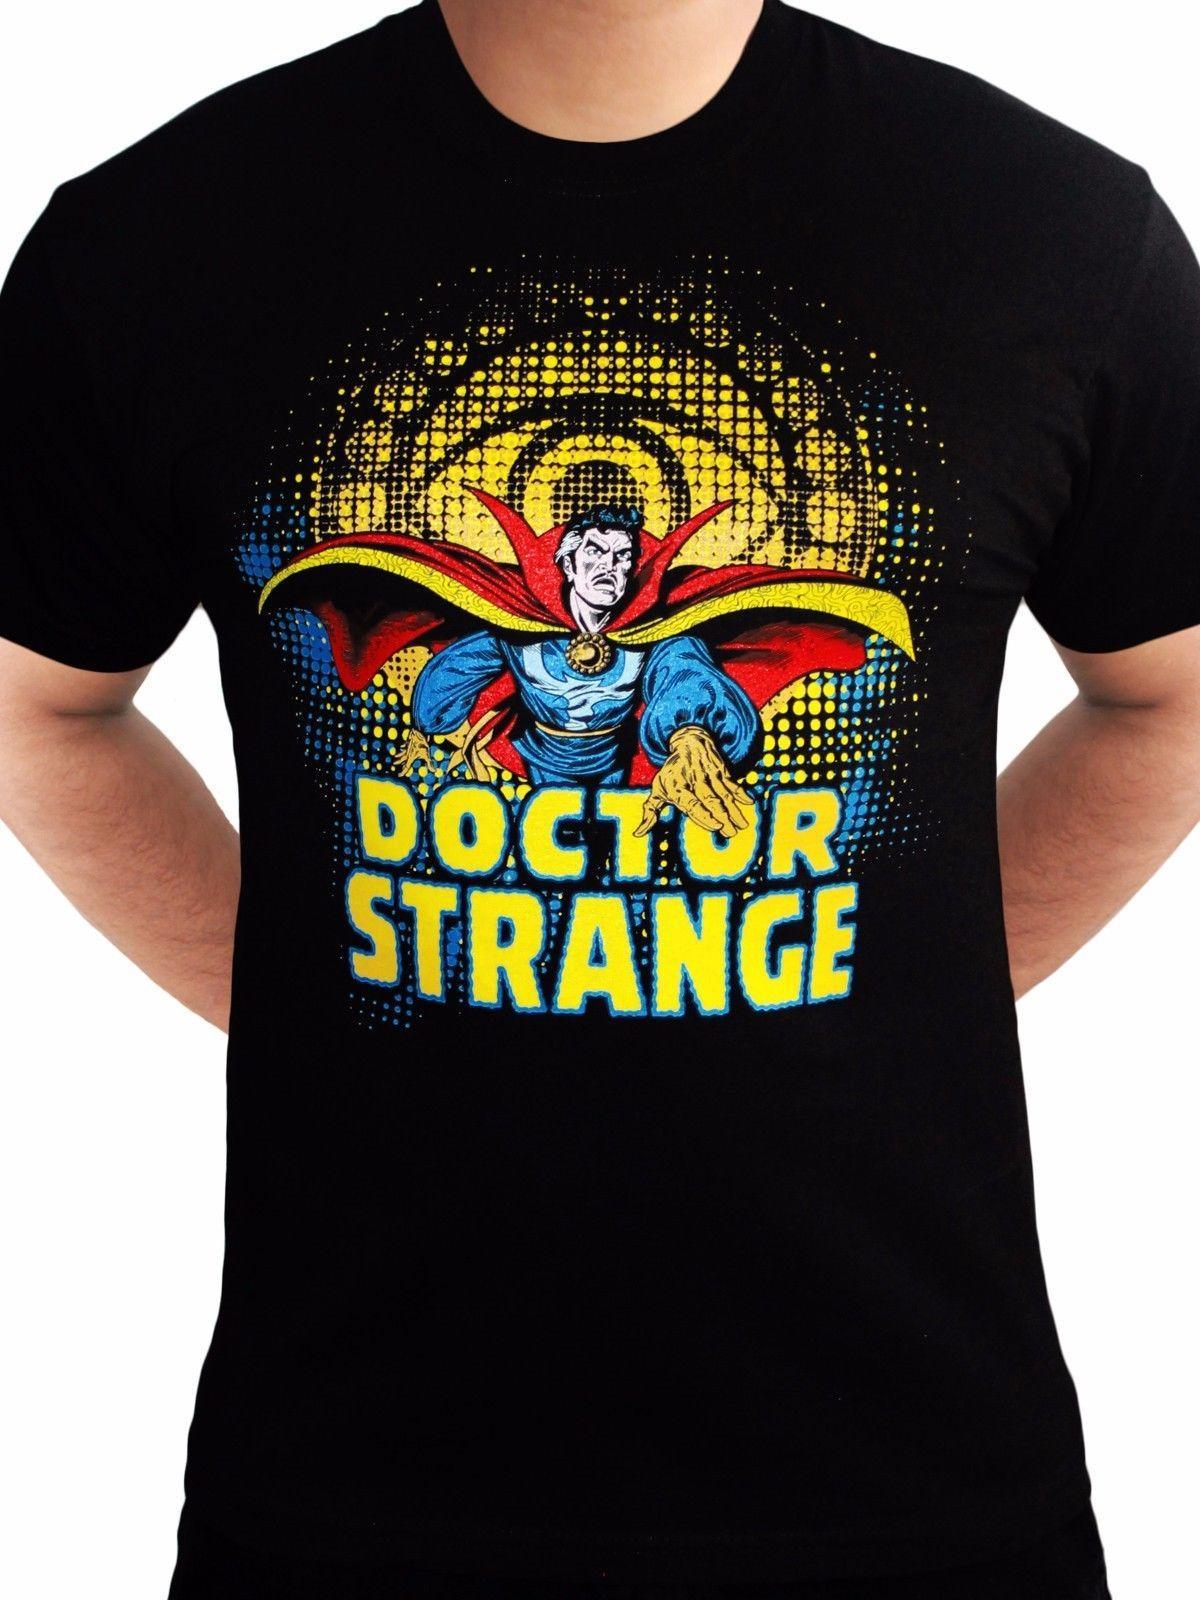 2a38de6bb48b2 Compre El Doctor DR Strange Logo Avengers Marvel Comics Para Hombre Negro  Camiseta Divertido Envío Unisex Casual Regalo A  12.96 Del  Fashionistas tees ...